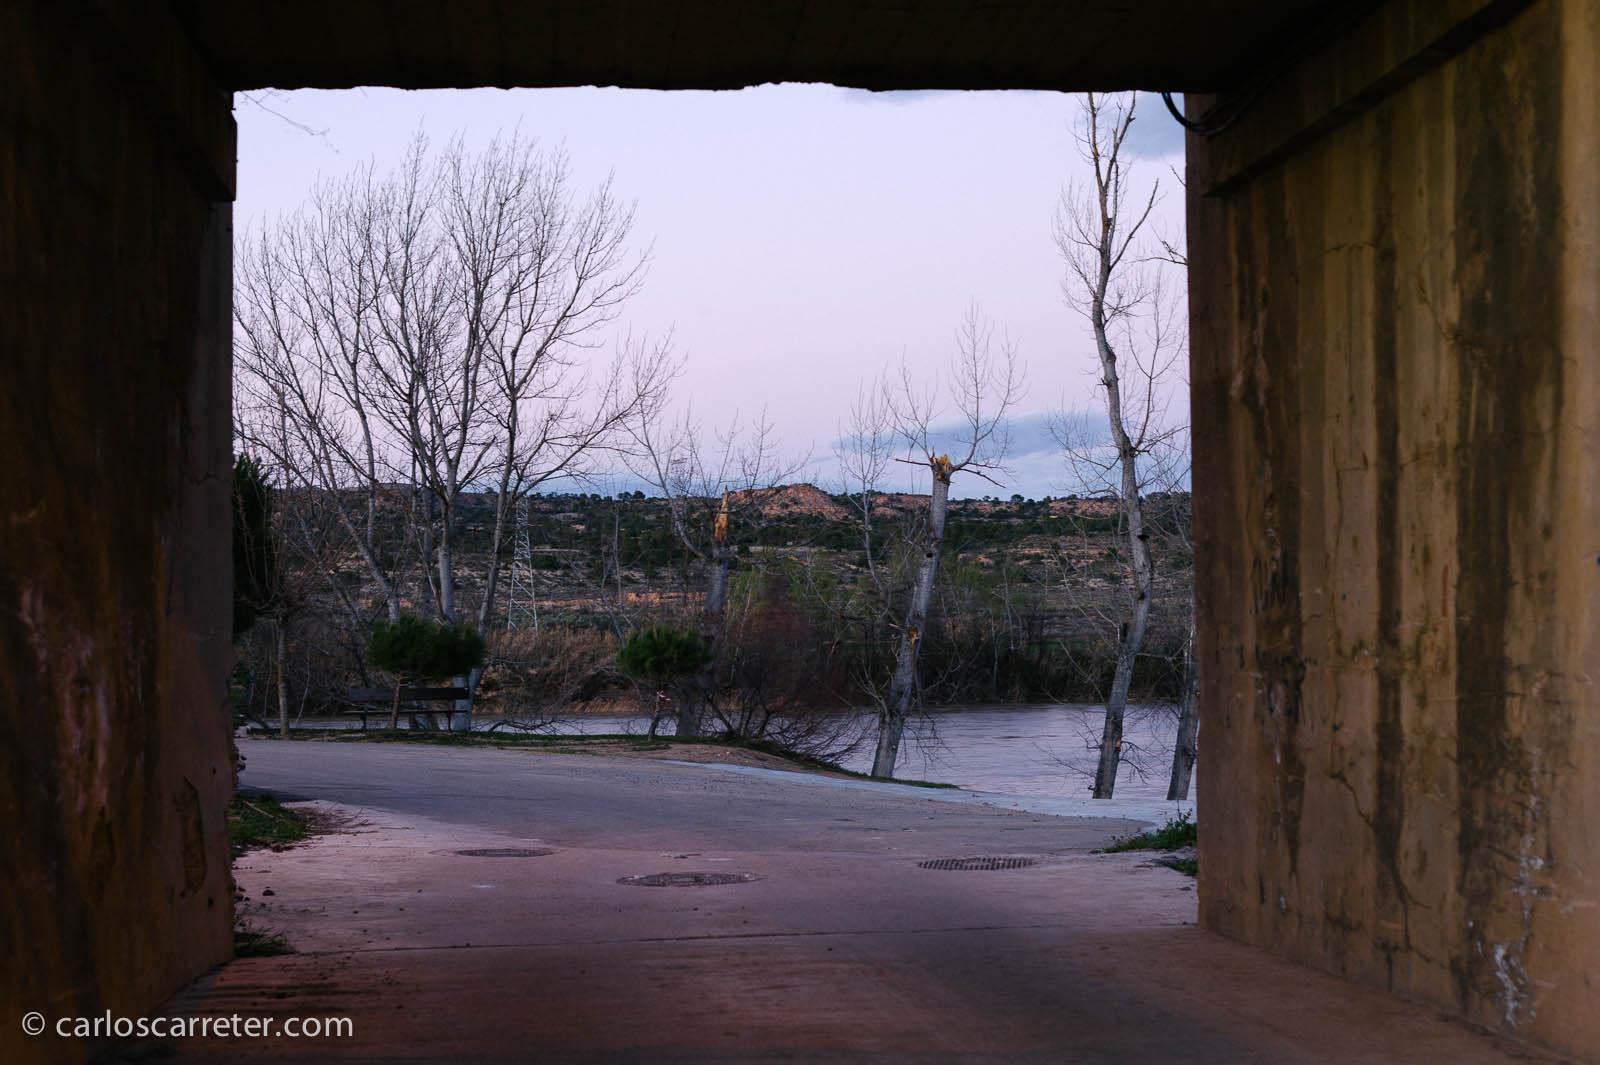 Paso bajo la antigua vía ferroviaria